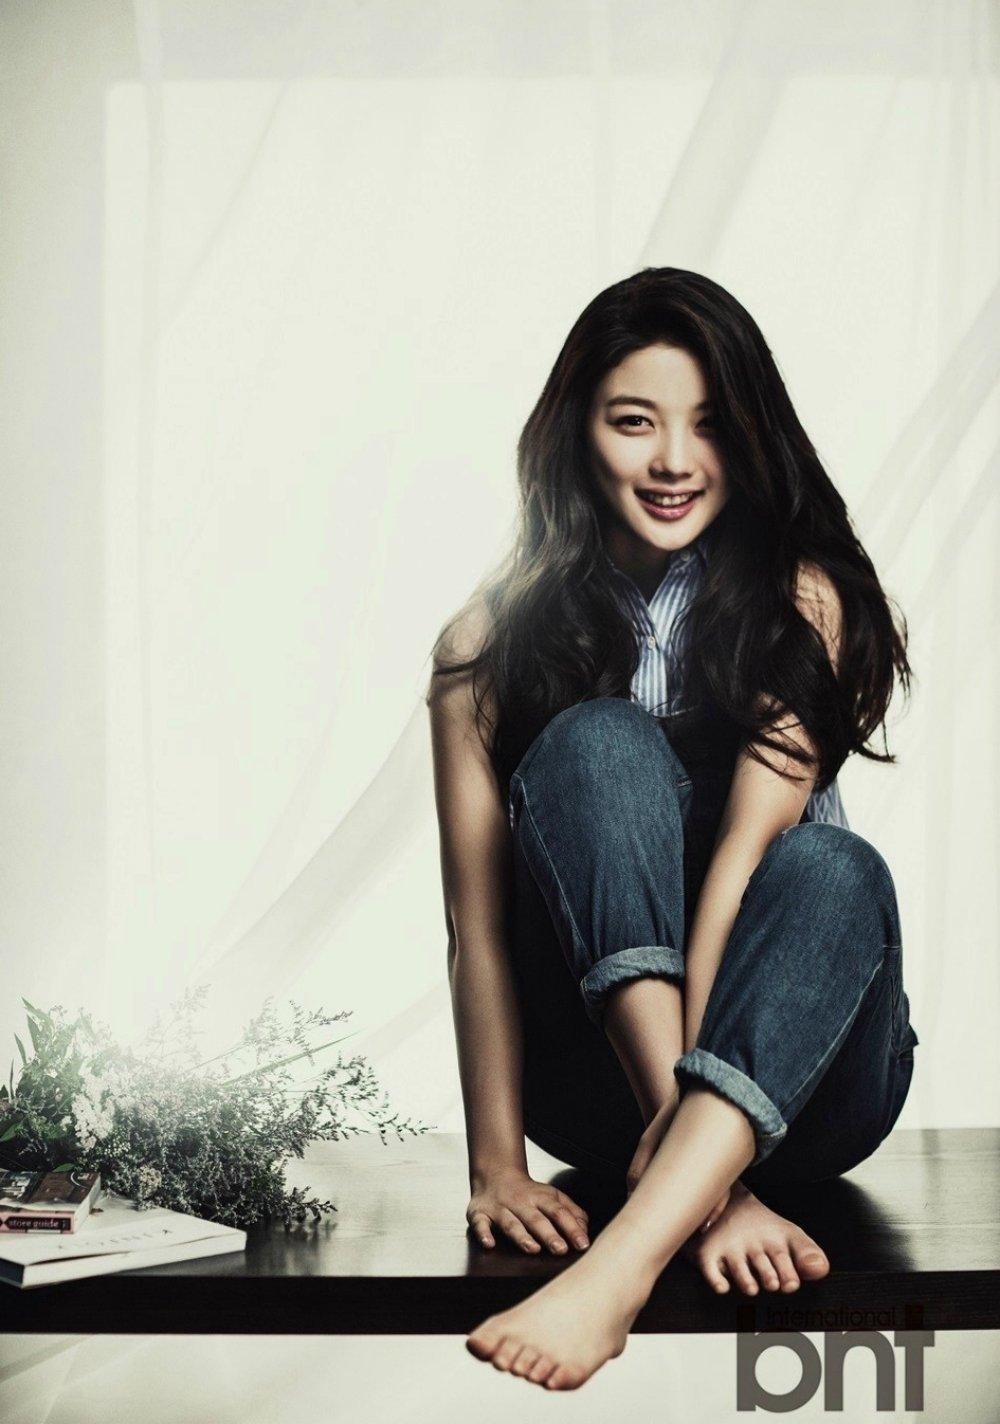 Feet Kim Yoo Yeon nudes (13 pics), Leaked